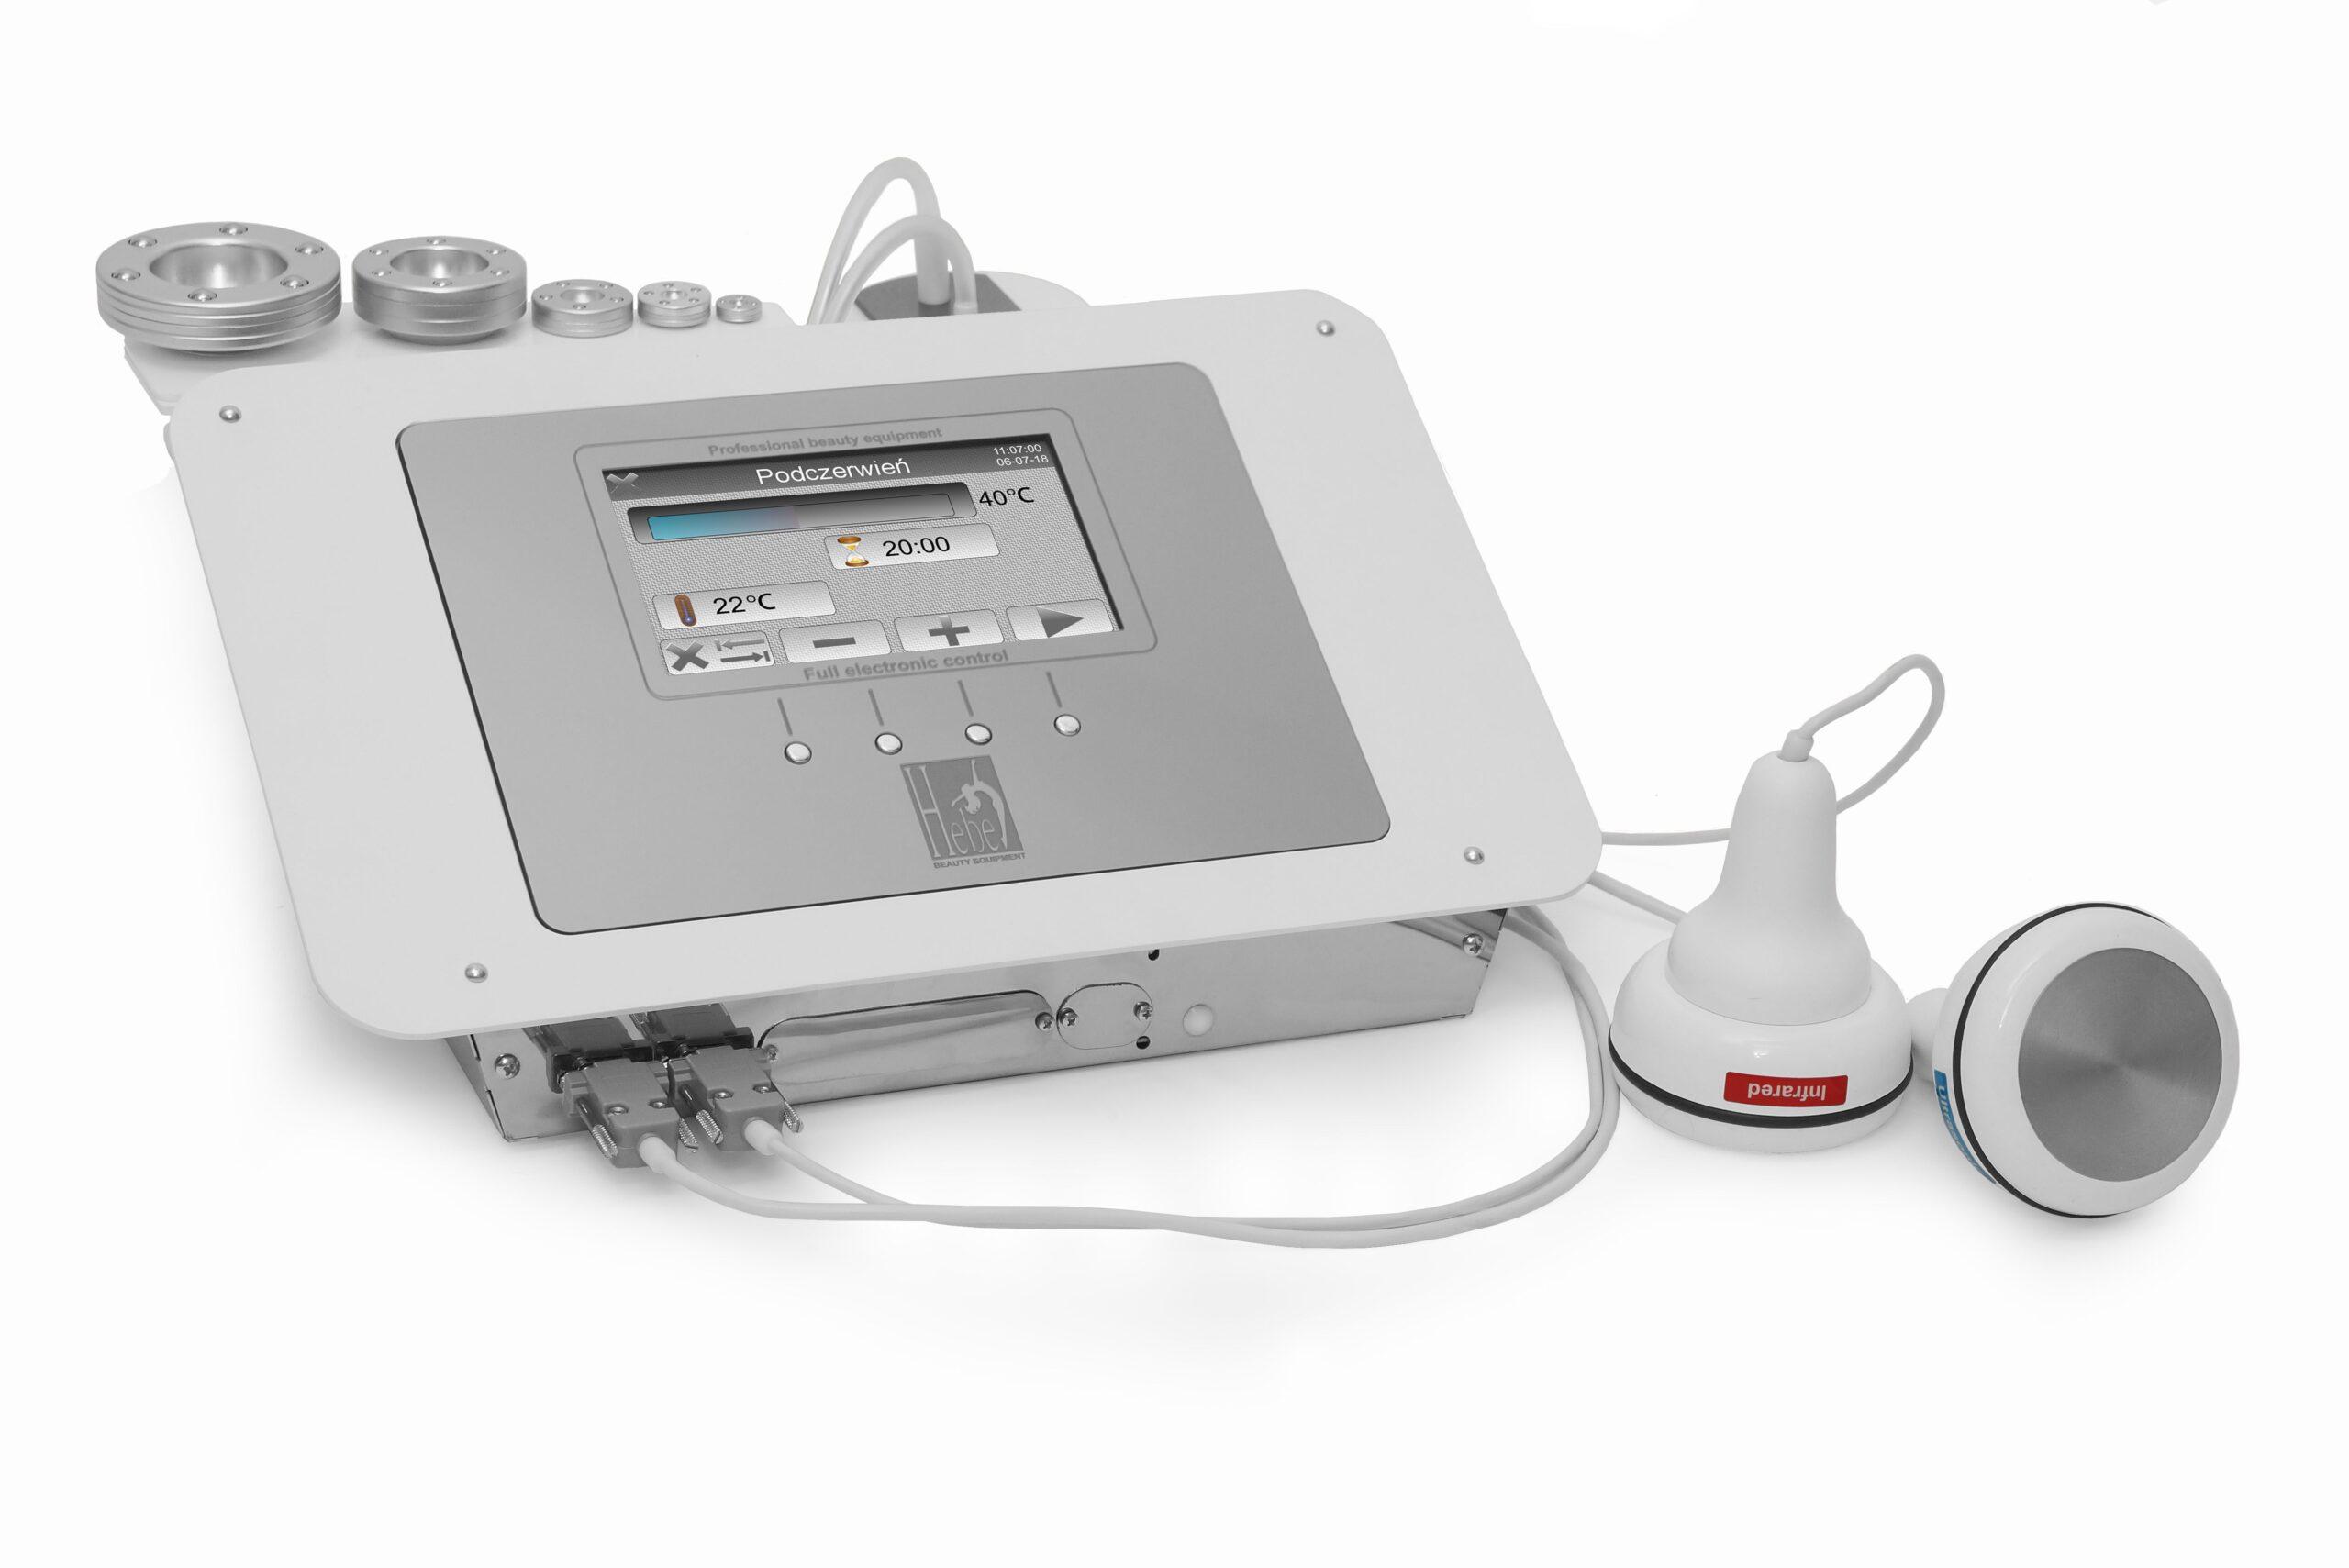 dermomasaż-i-liposukcja-ultradźwiękowa-infrared